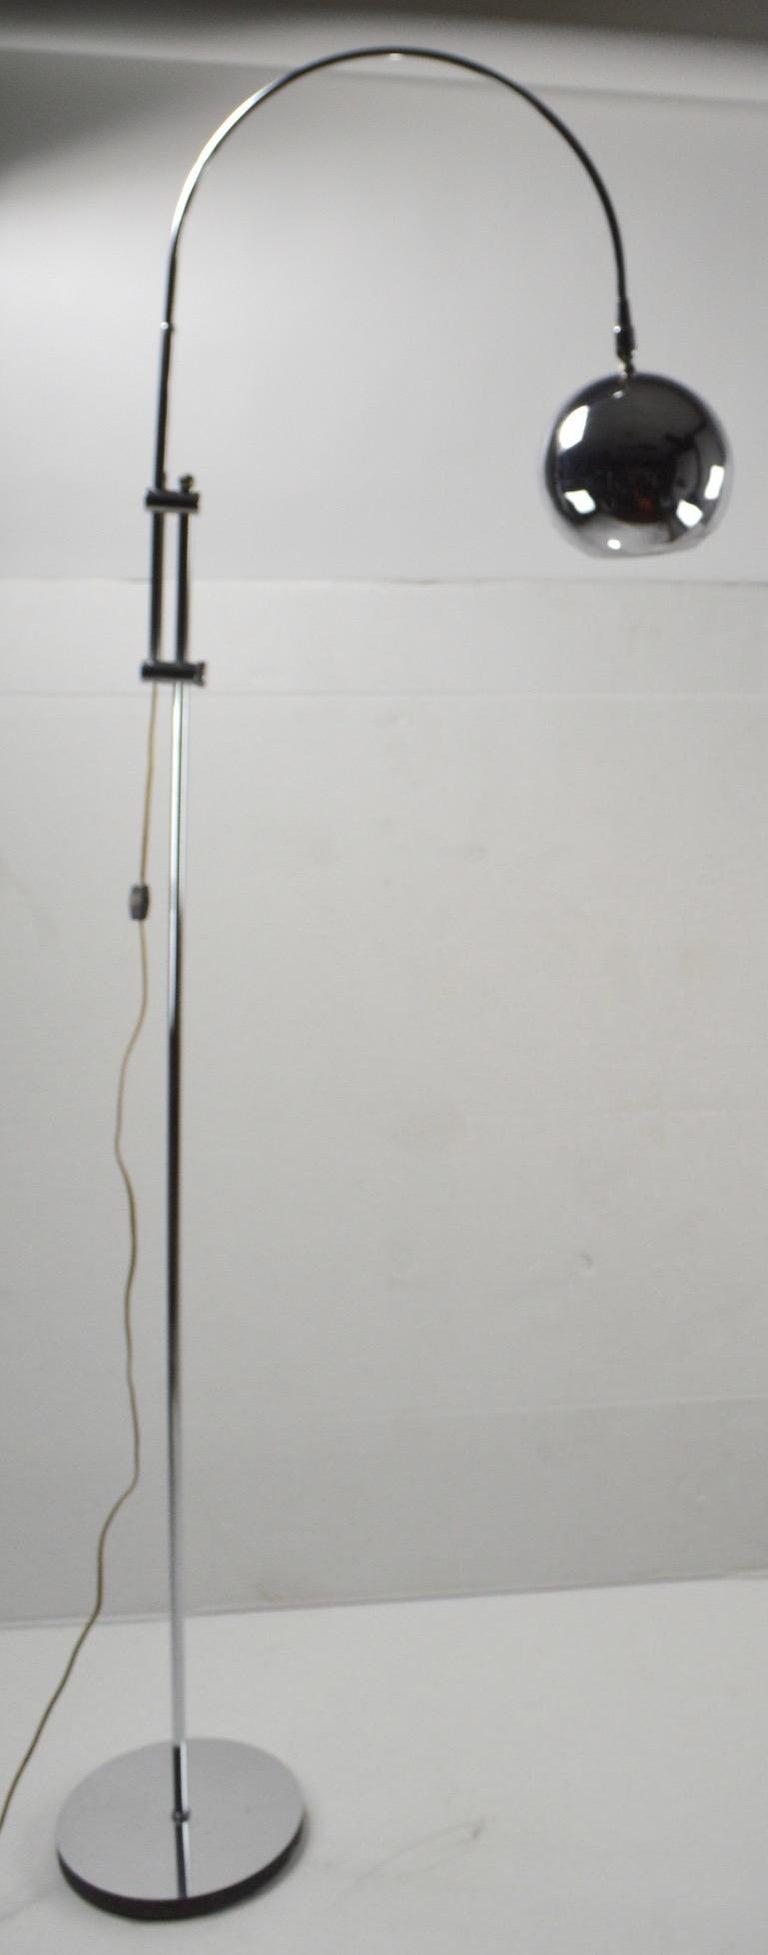 American Adjustable Chrome Arc Lamp with Eyeball Shade For Sale